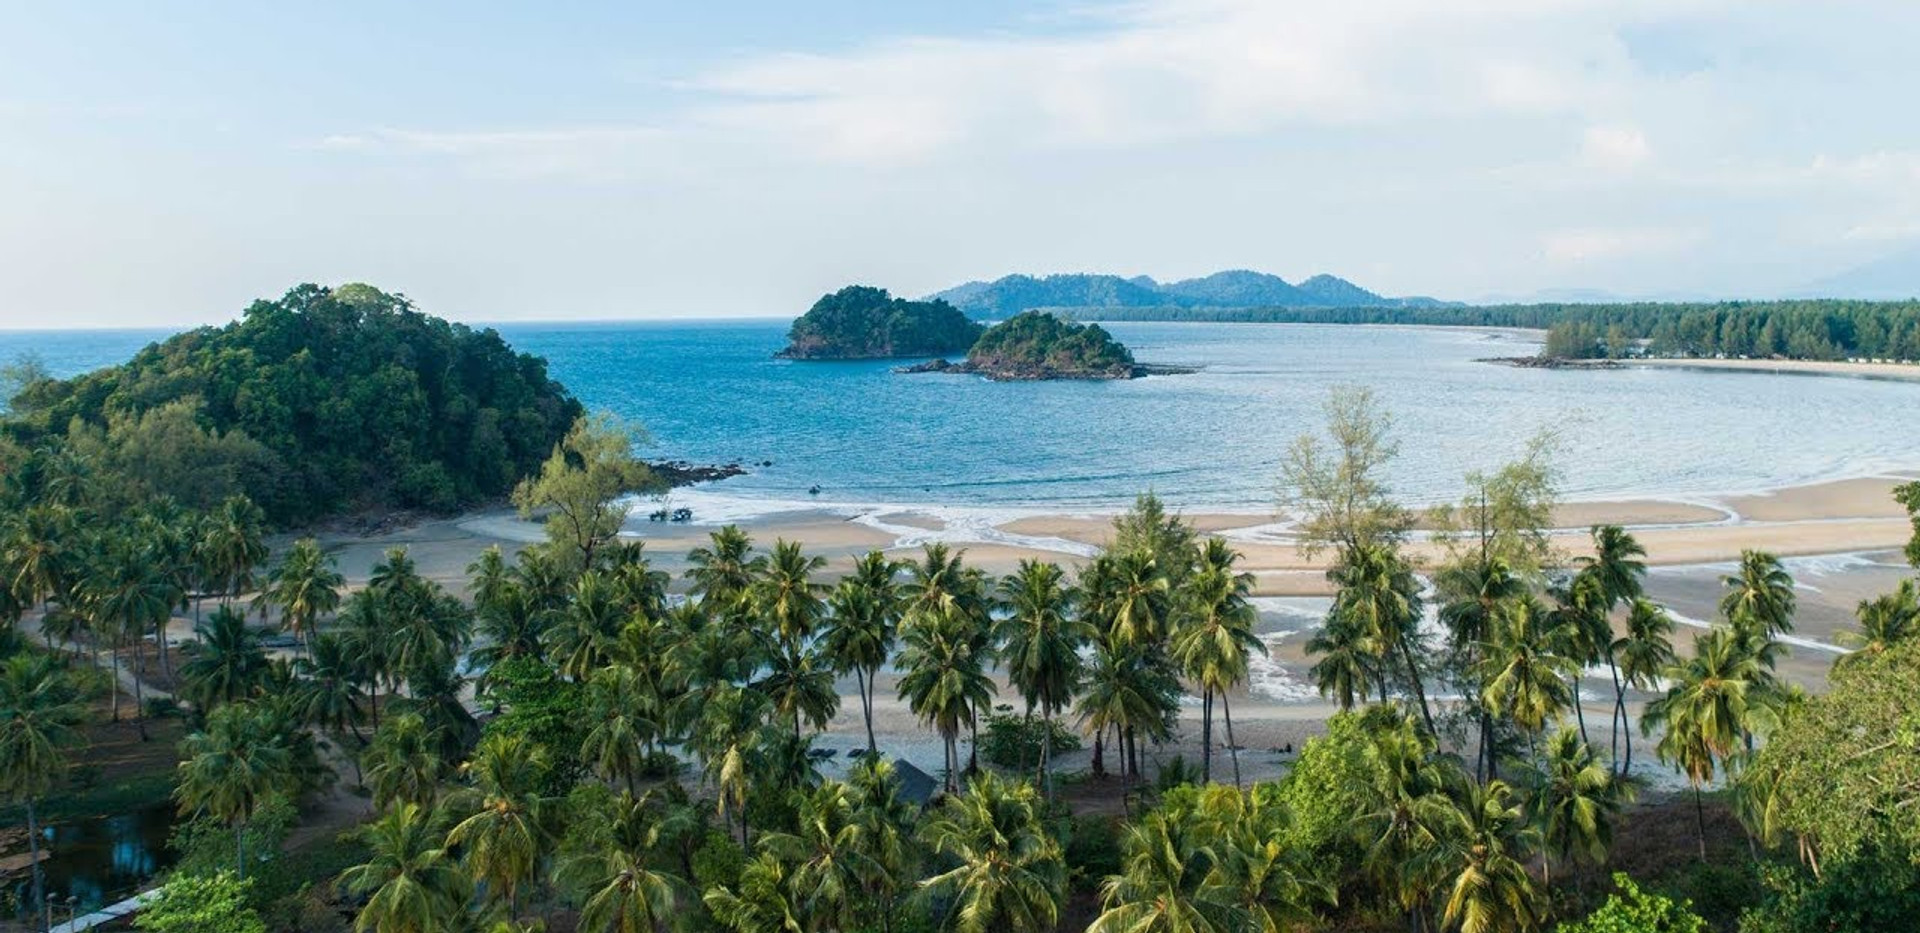 Thailand Yoga Holidays Destination Eco Island Video